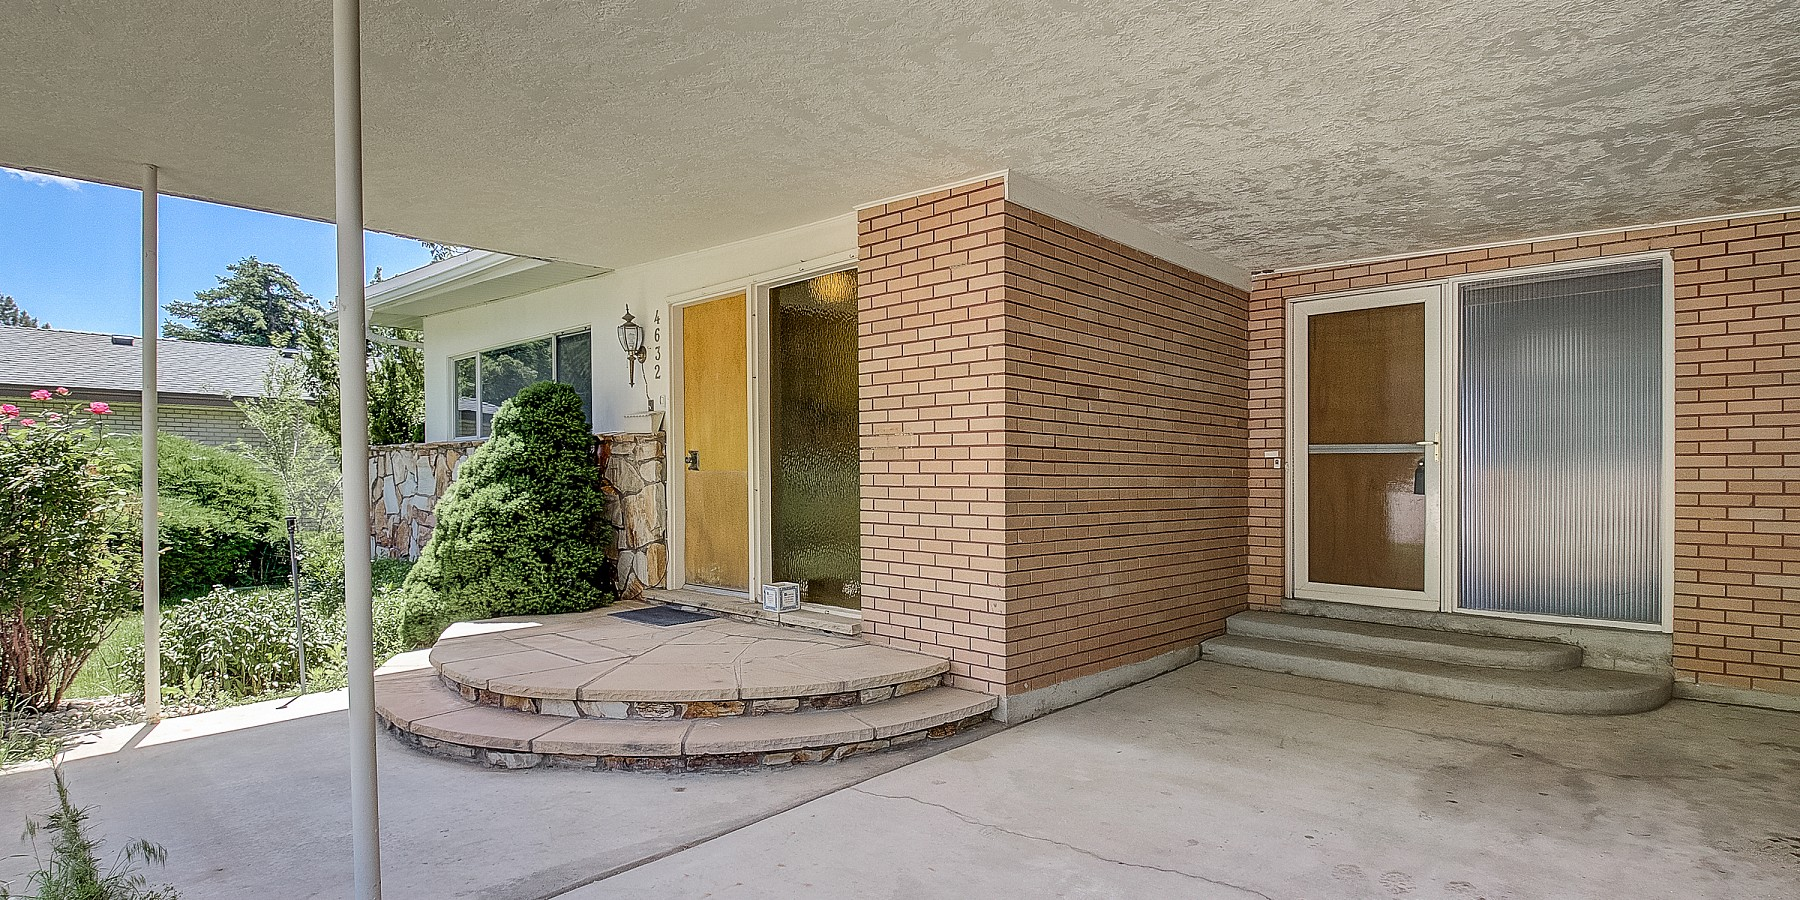 4632 S. Idlewild Road, Salt Lake City, UT 84124